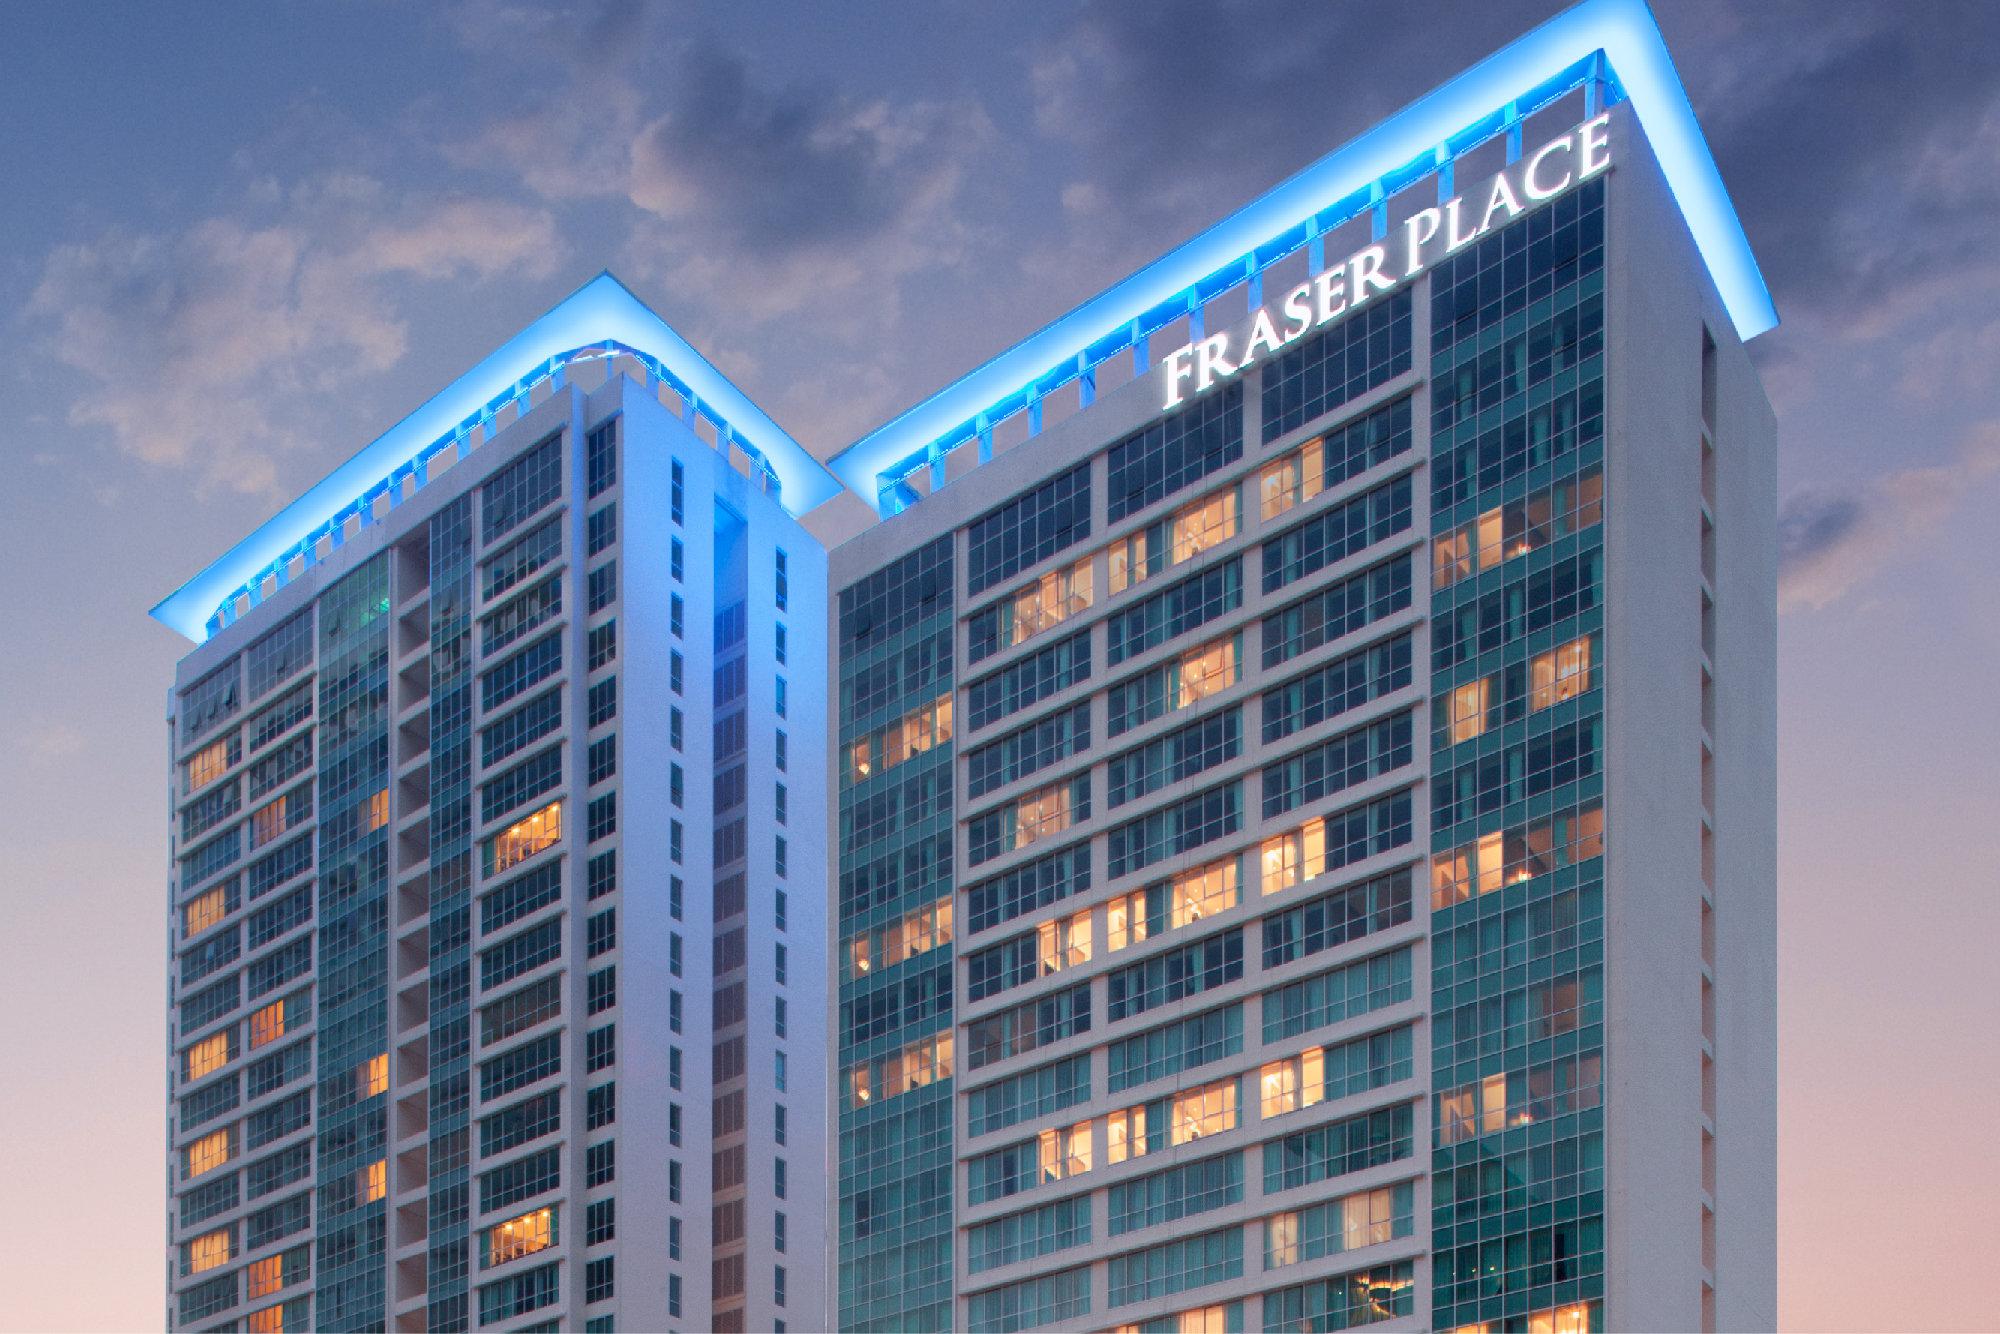 Fraser Place Setiabudi Jakarta Jakarta Indonesia Hotels First Class Hotels In Jakarta Gds Reservation Codes Travelage West